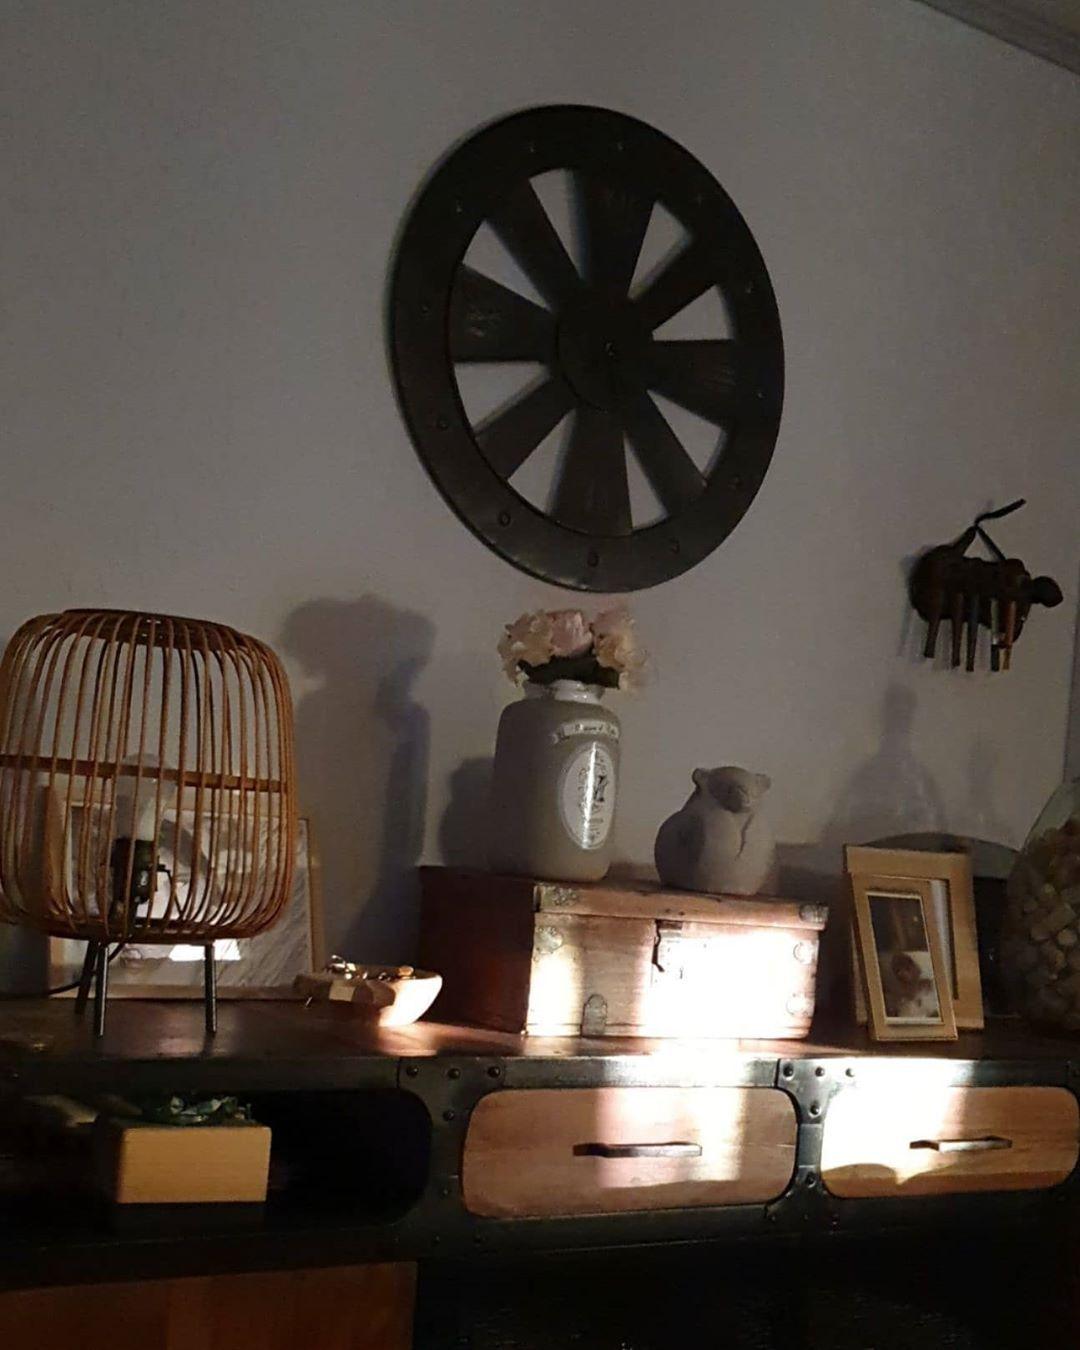 awesome  #18h39 #antique_r_us #bambou #broc #brocante #cadeauenavance #chezmoi #corse #corsica #decoaddict #decorationinterieur #lampe #lovethefeedsyoufollow #lovethefeedsyoufollow_home #lumiere #madecoamoi #maisondumonde #mydecor #soleil #sun